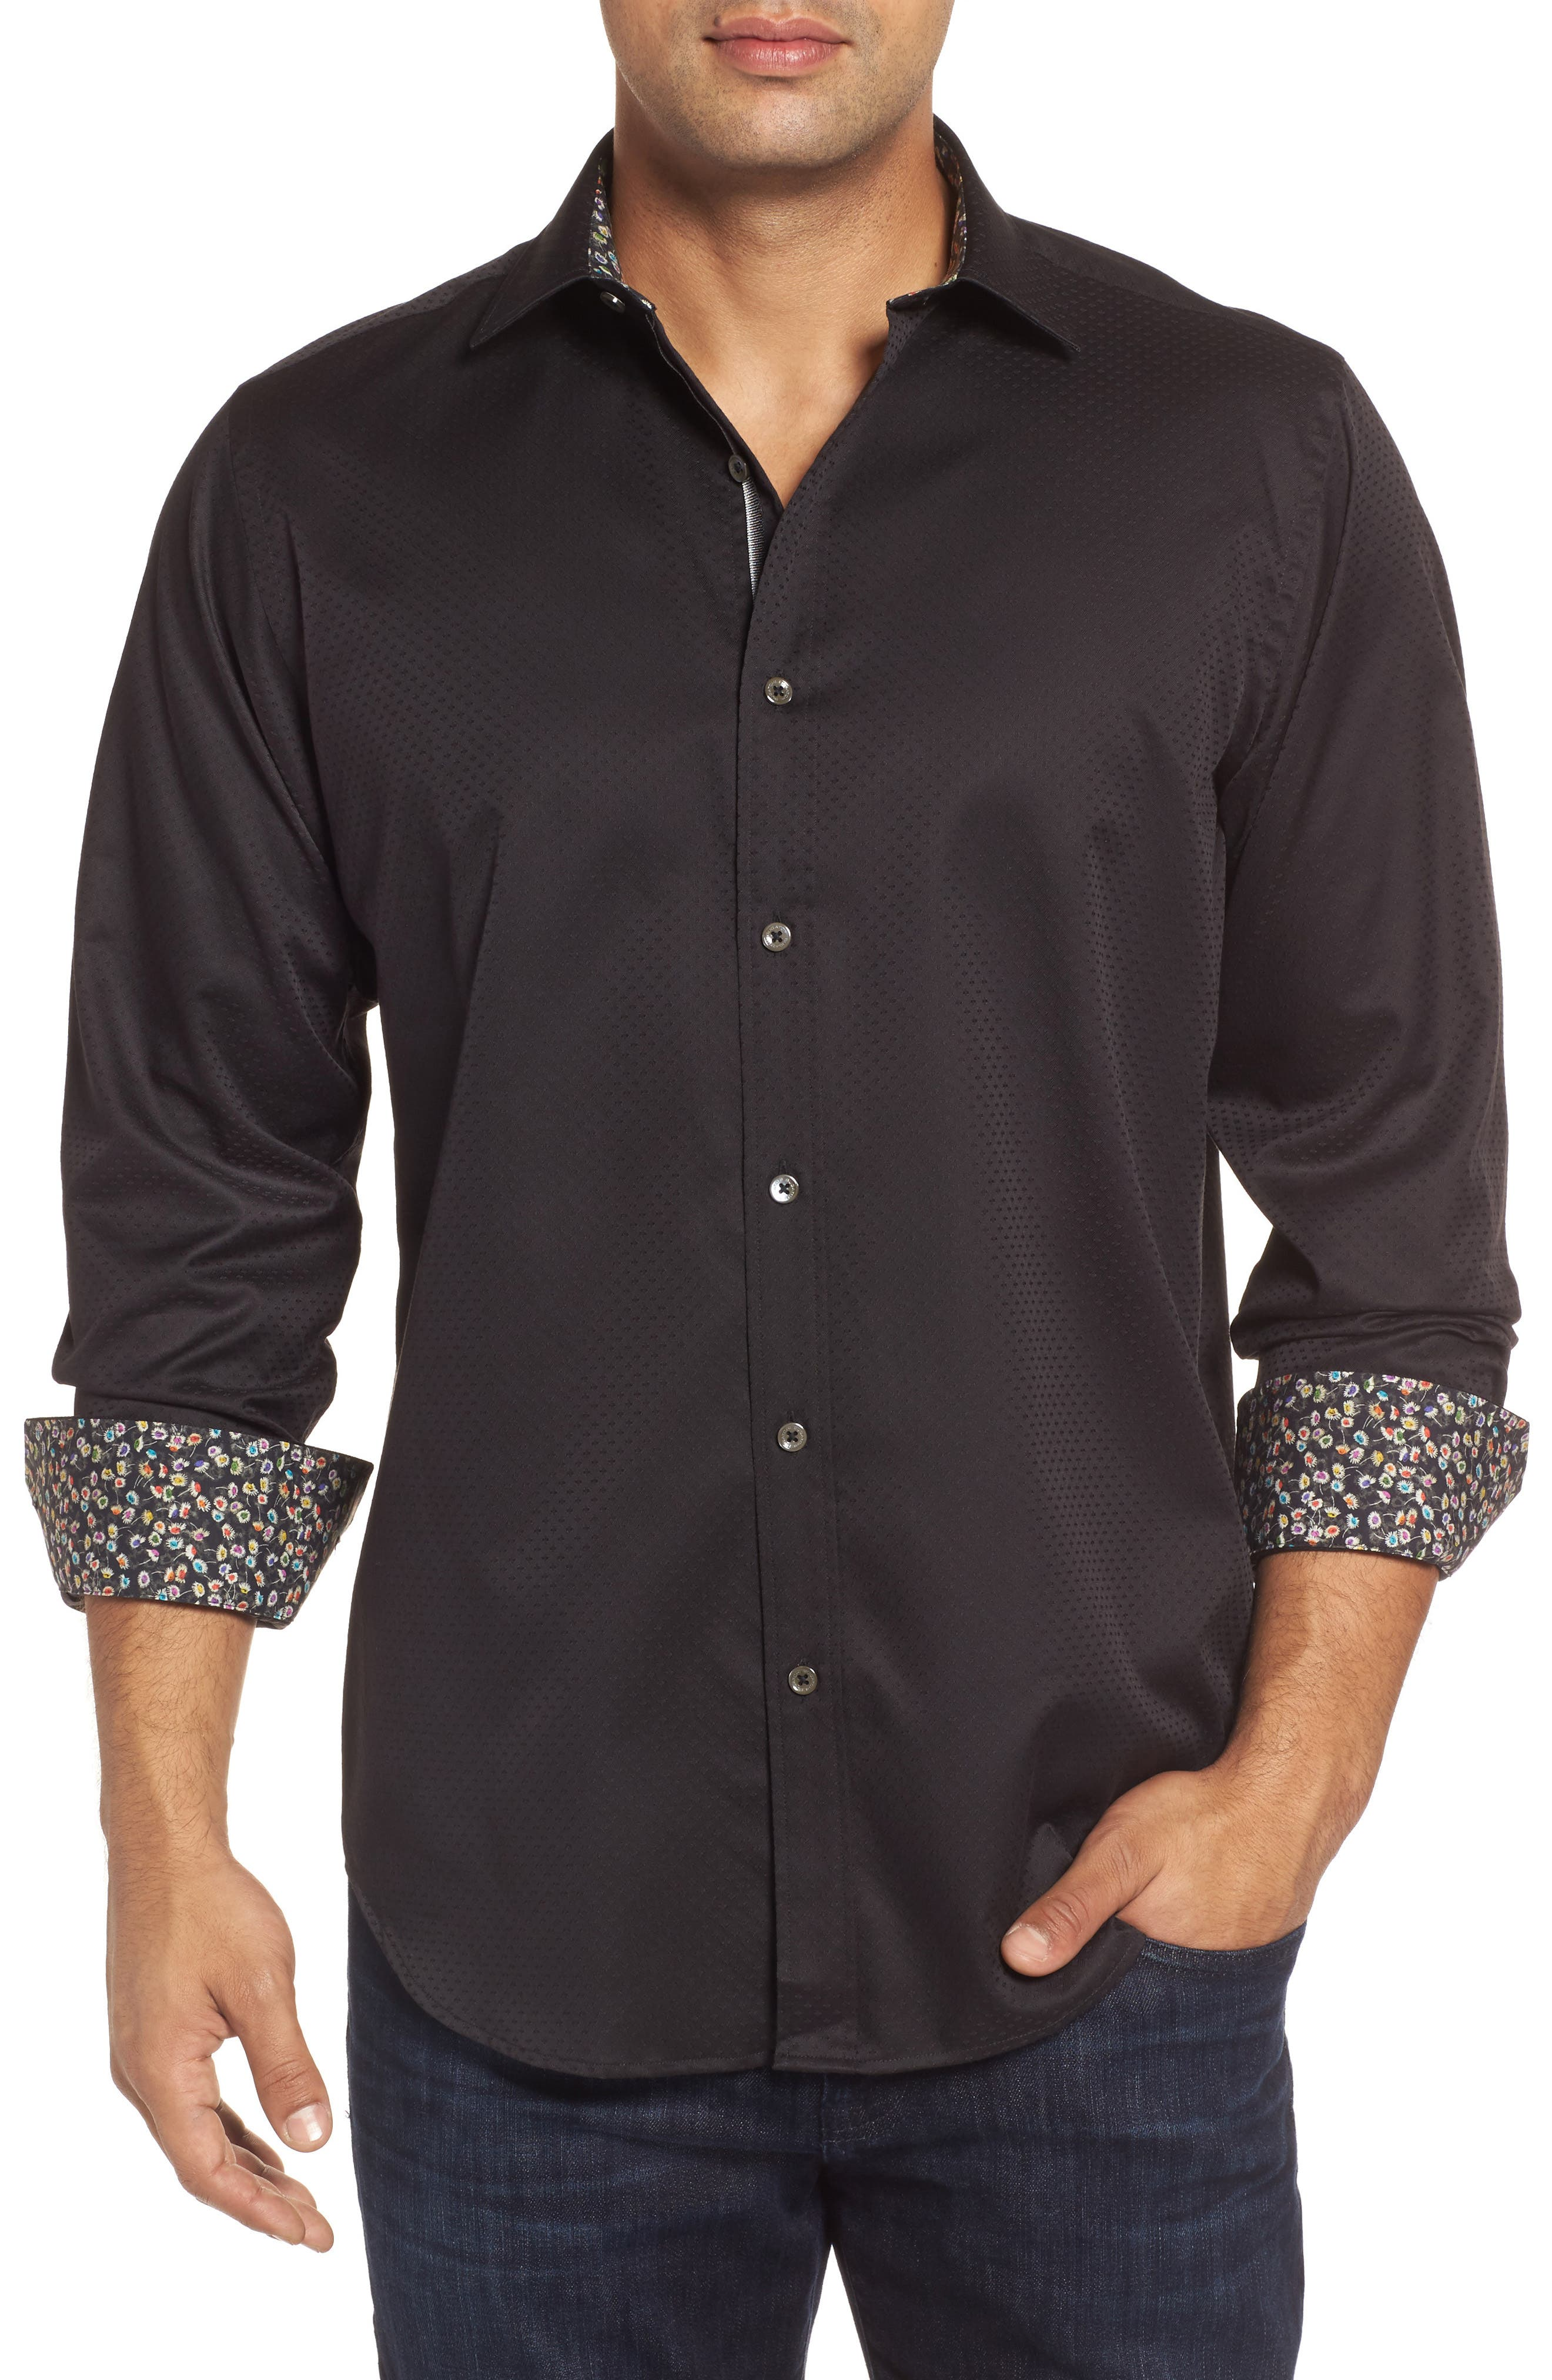 Alternate Image 1 Selected - Bugatchi Classic Fit Diamond Jacquard Sport Shirt